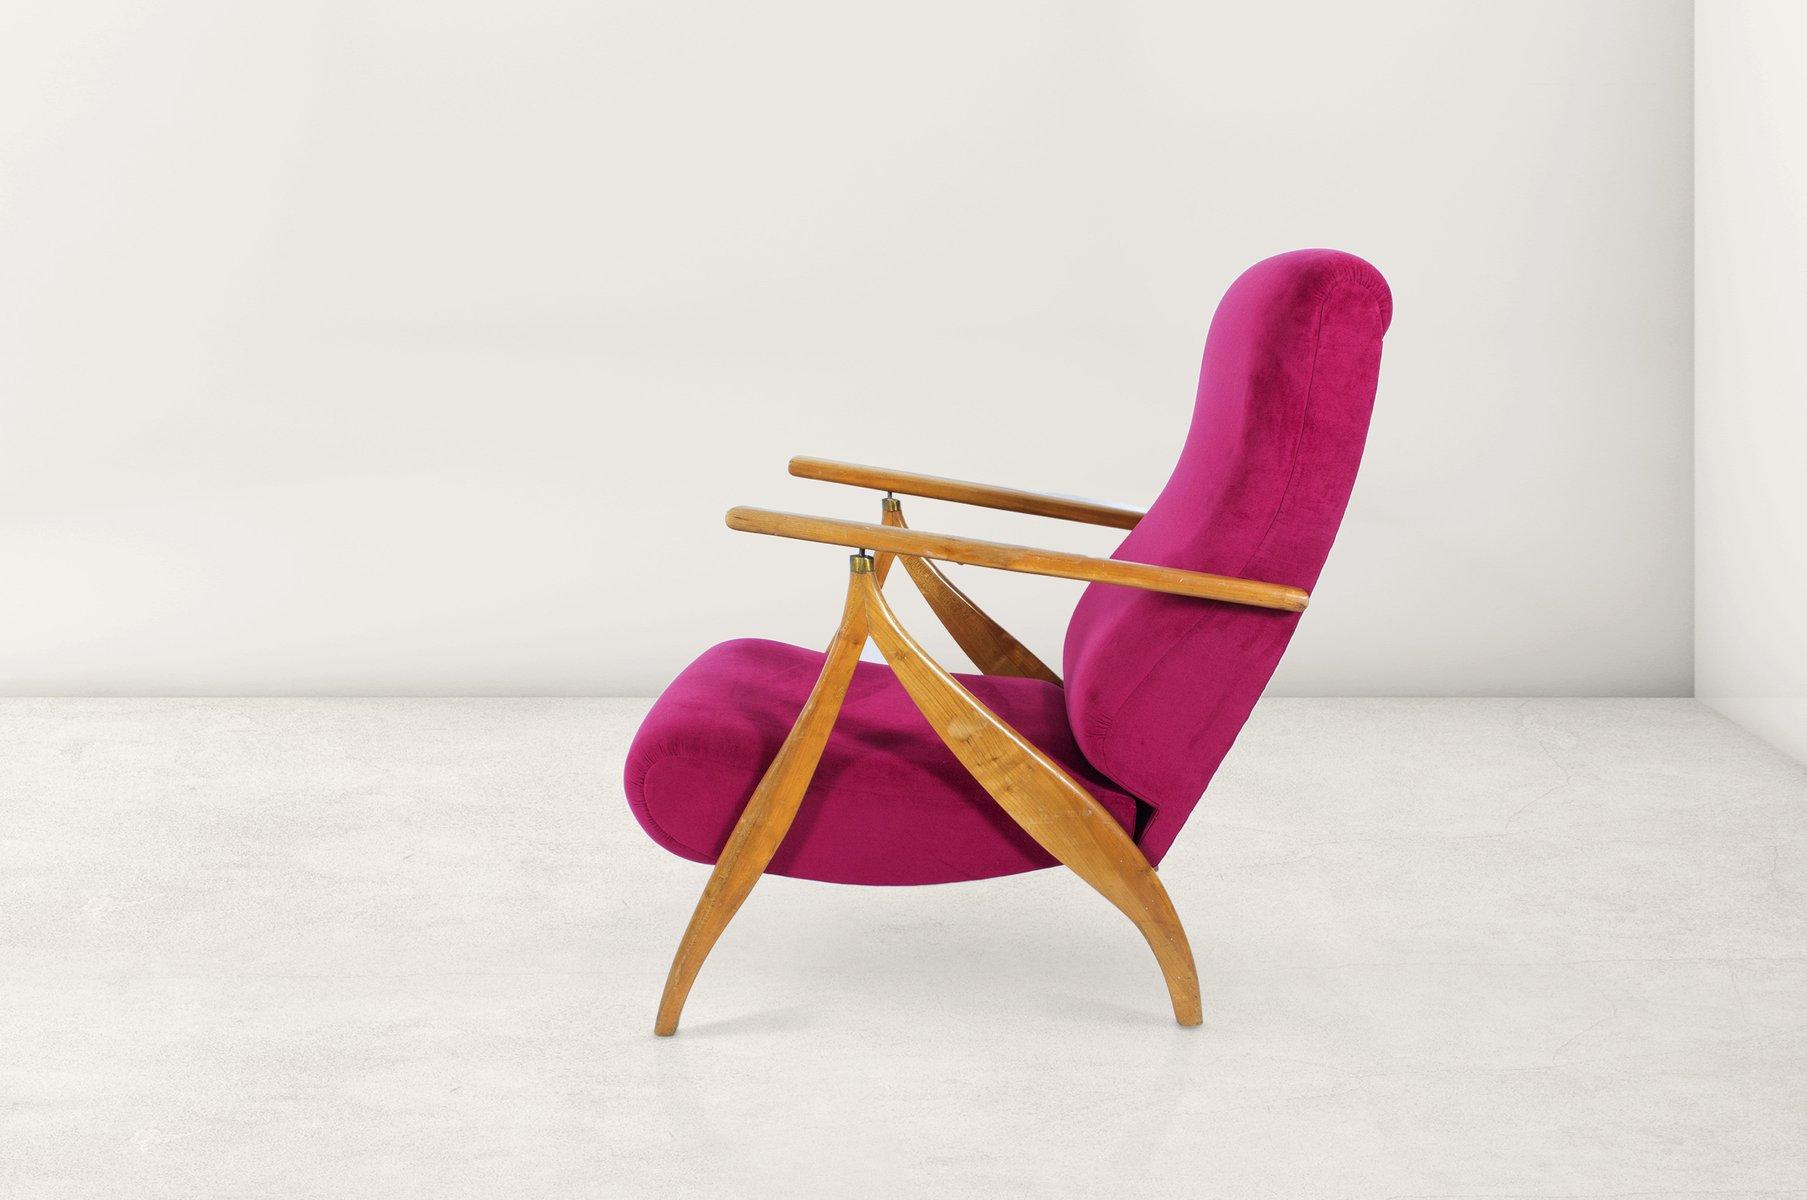 Bemerkenswert Sessel Hohe Rückenlehne Galerie Von Preis: 1.666,00 € Regulärer Preis: 2.142,00 €